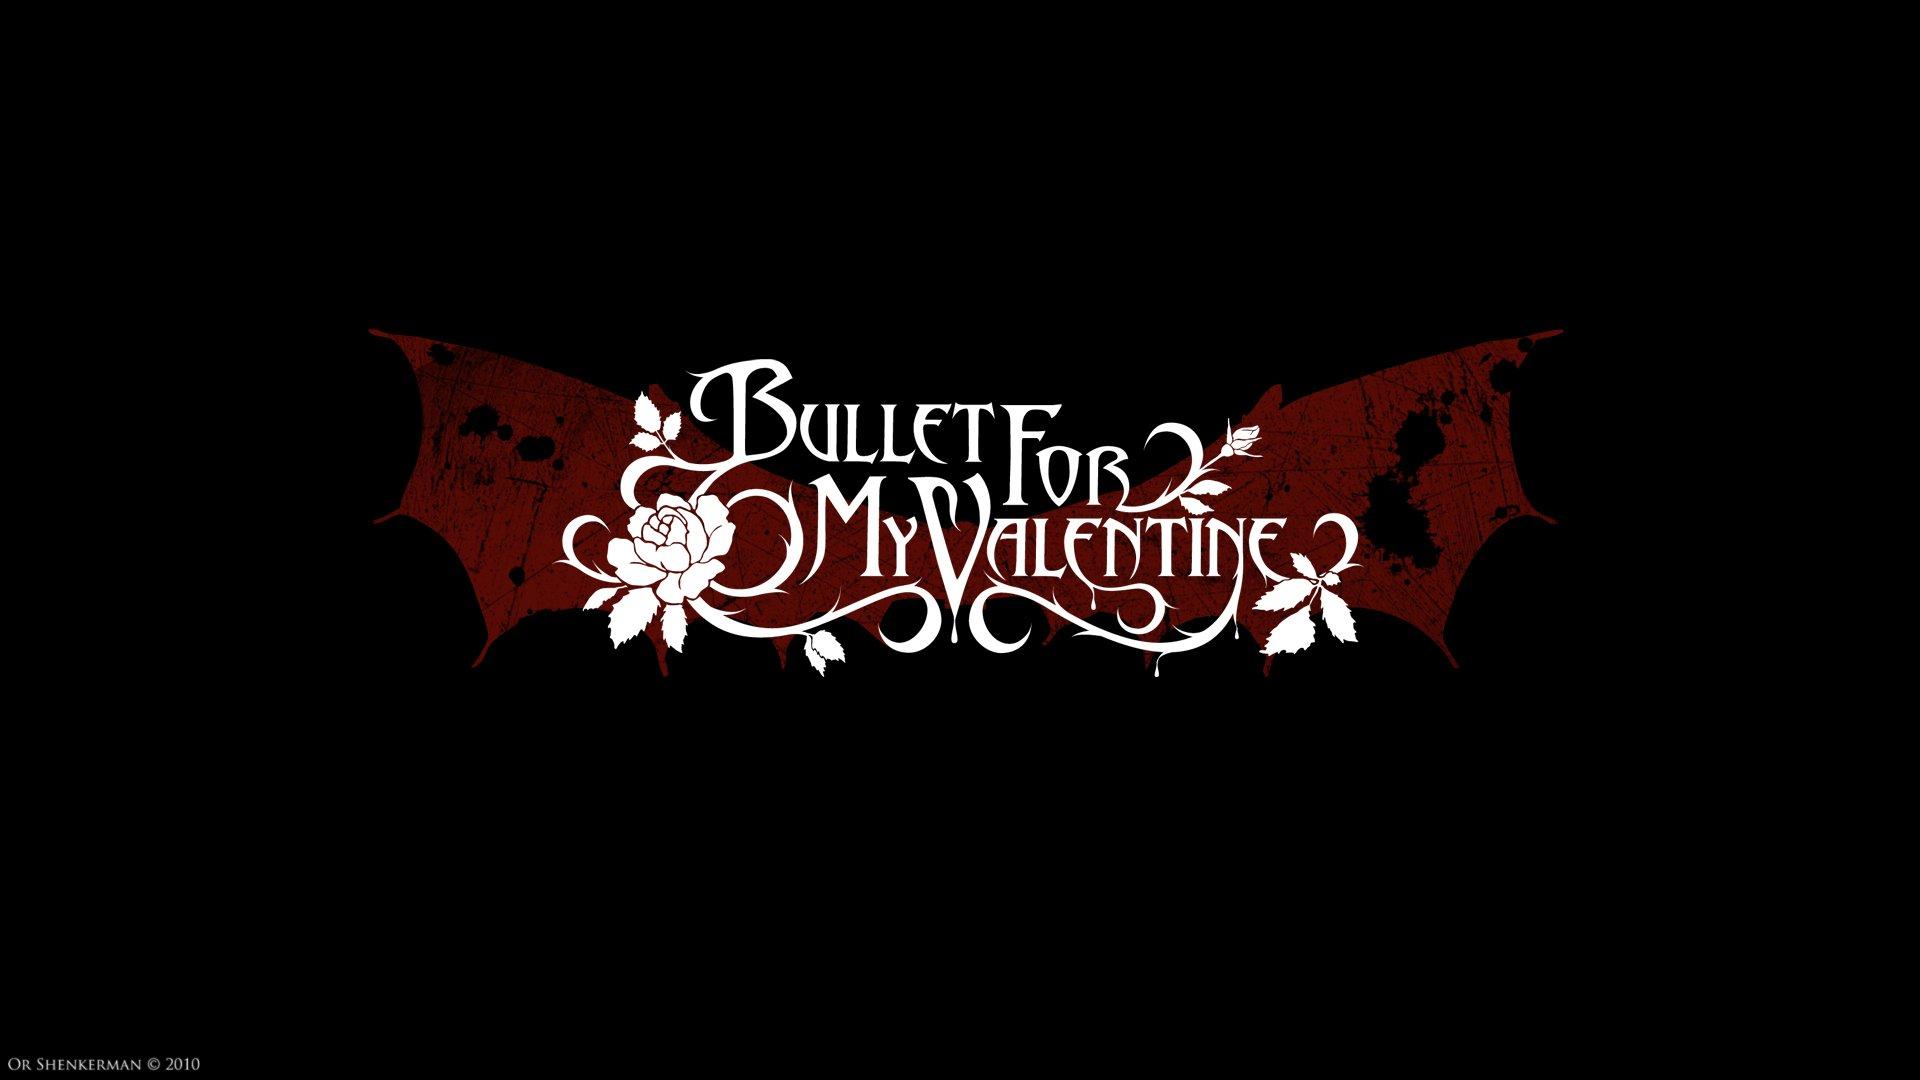 Bullet For My Valentine Wallpaper,Bullet For My Valentine ...